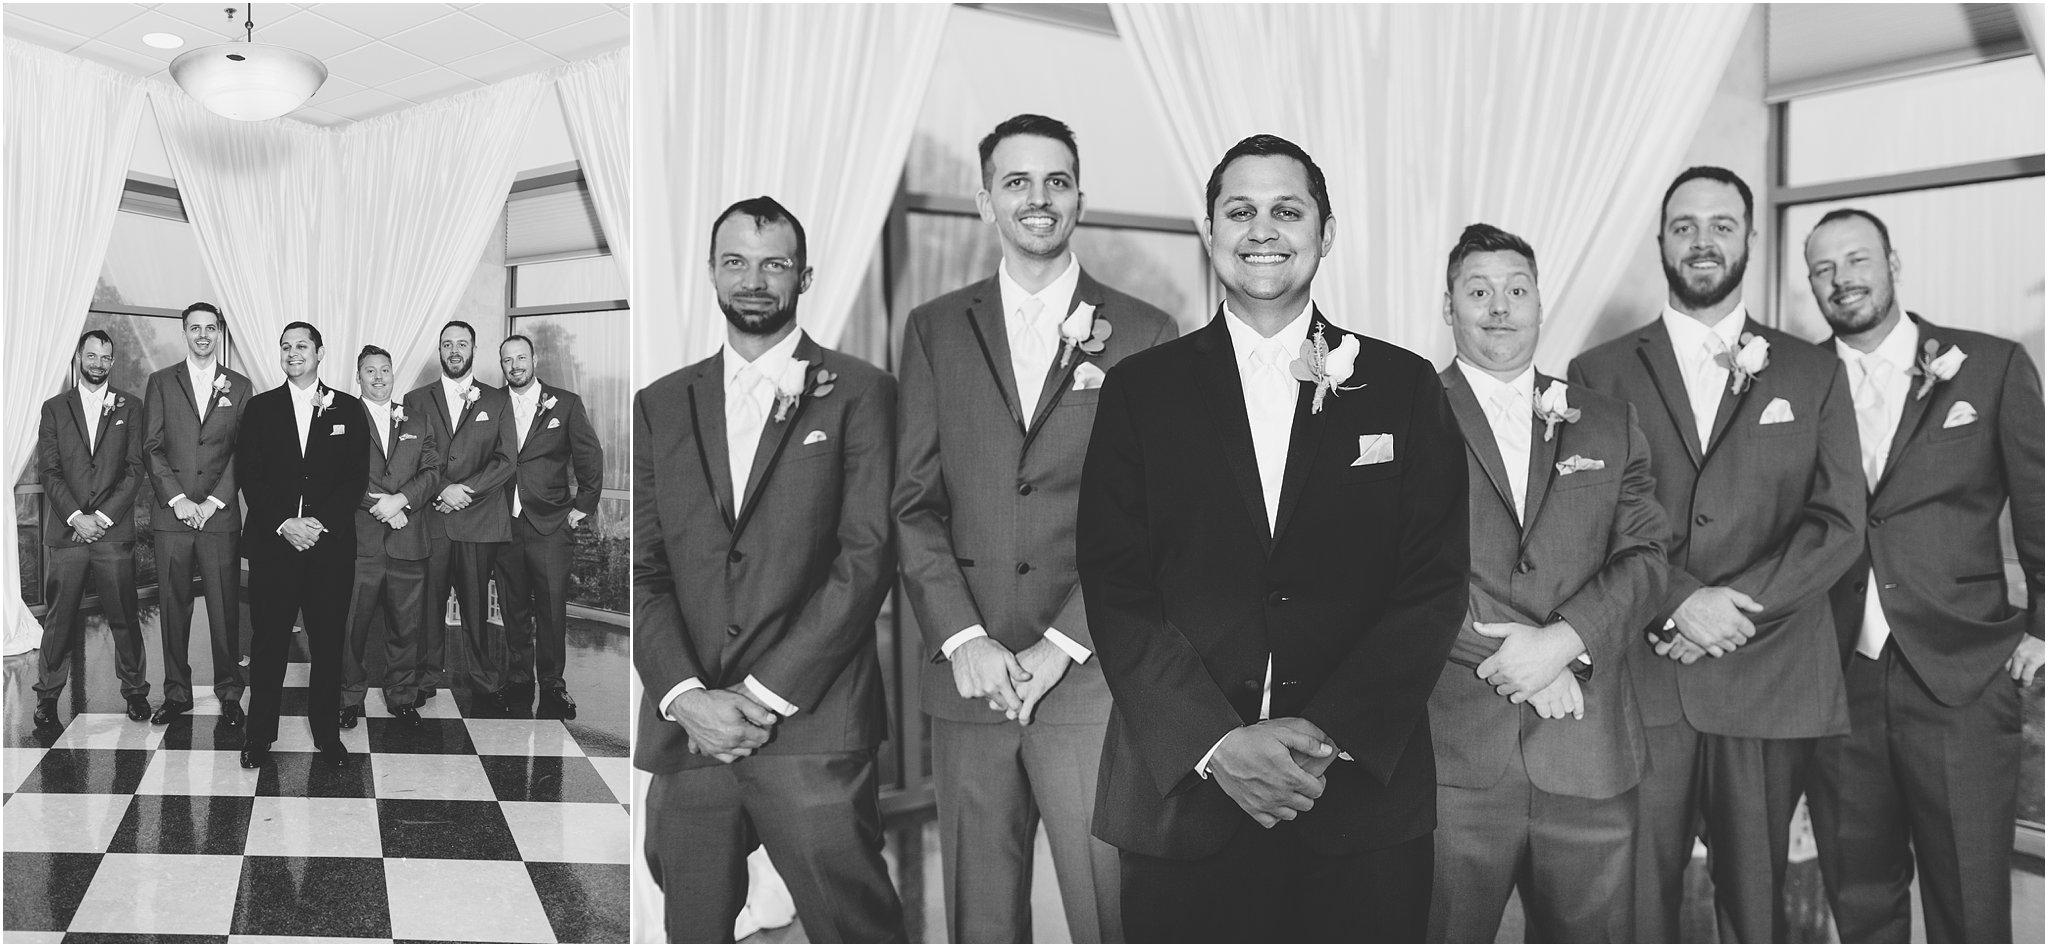 jessica_ryan_photography_virginia_wedding_photographer_wedding_hurricane_norfolk_botanical_gardens_hurricane_matthew_wedding_3581